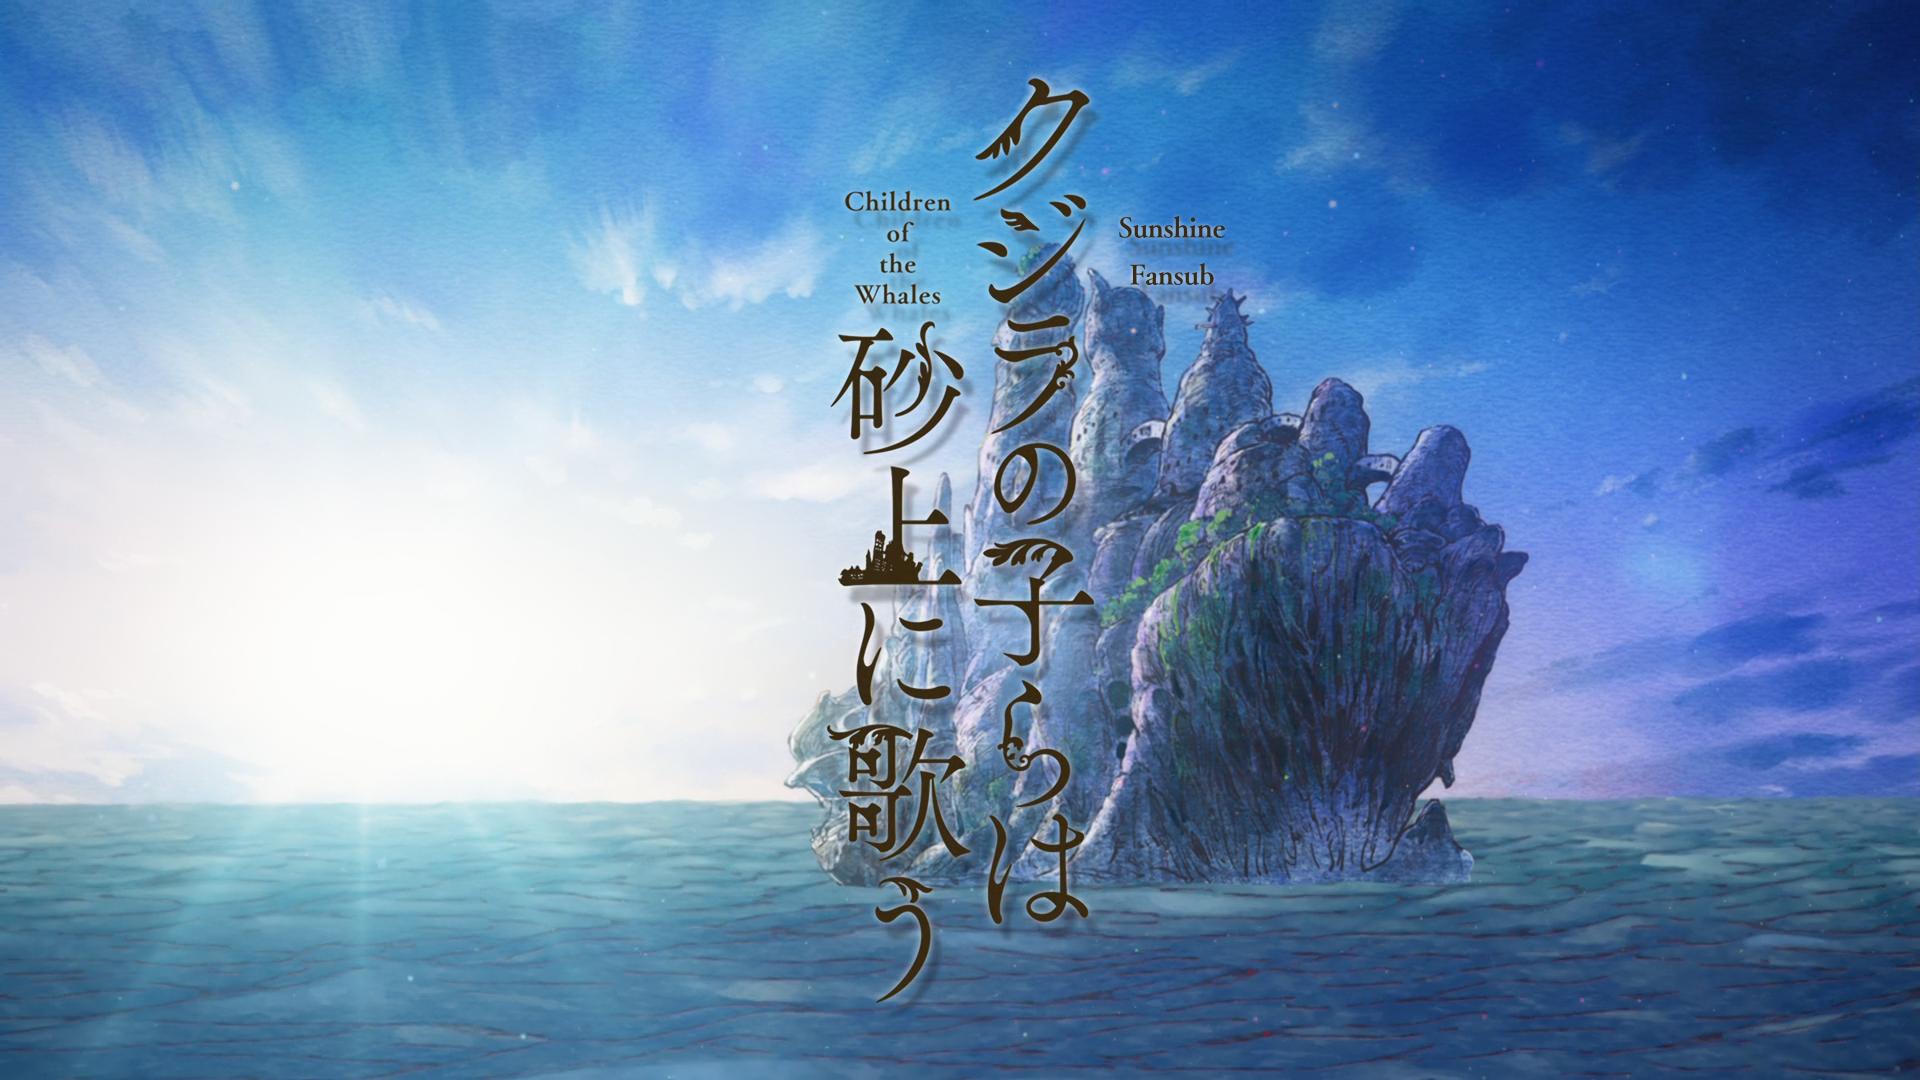 [Asenshi] Kujira no Kora wa Sajou ni Utau - Children of the Whales - 01 [1068F6DD]_001_3508